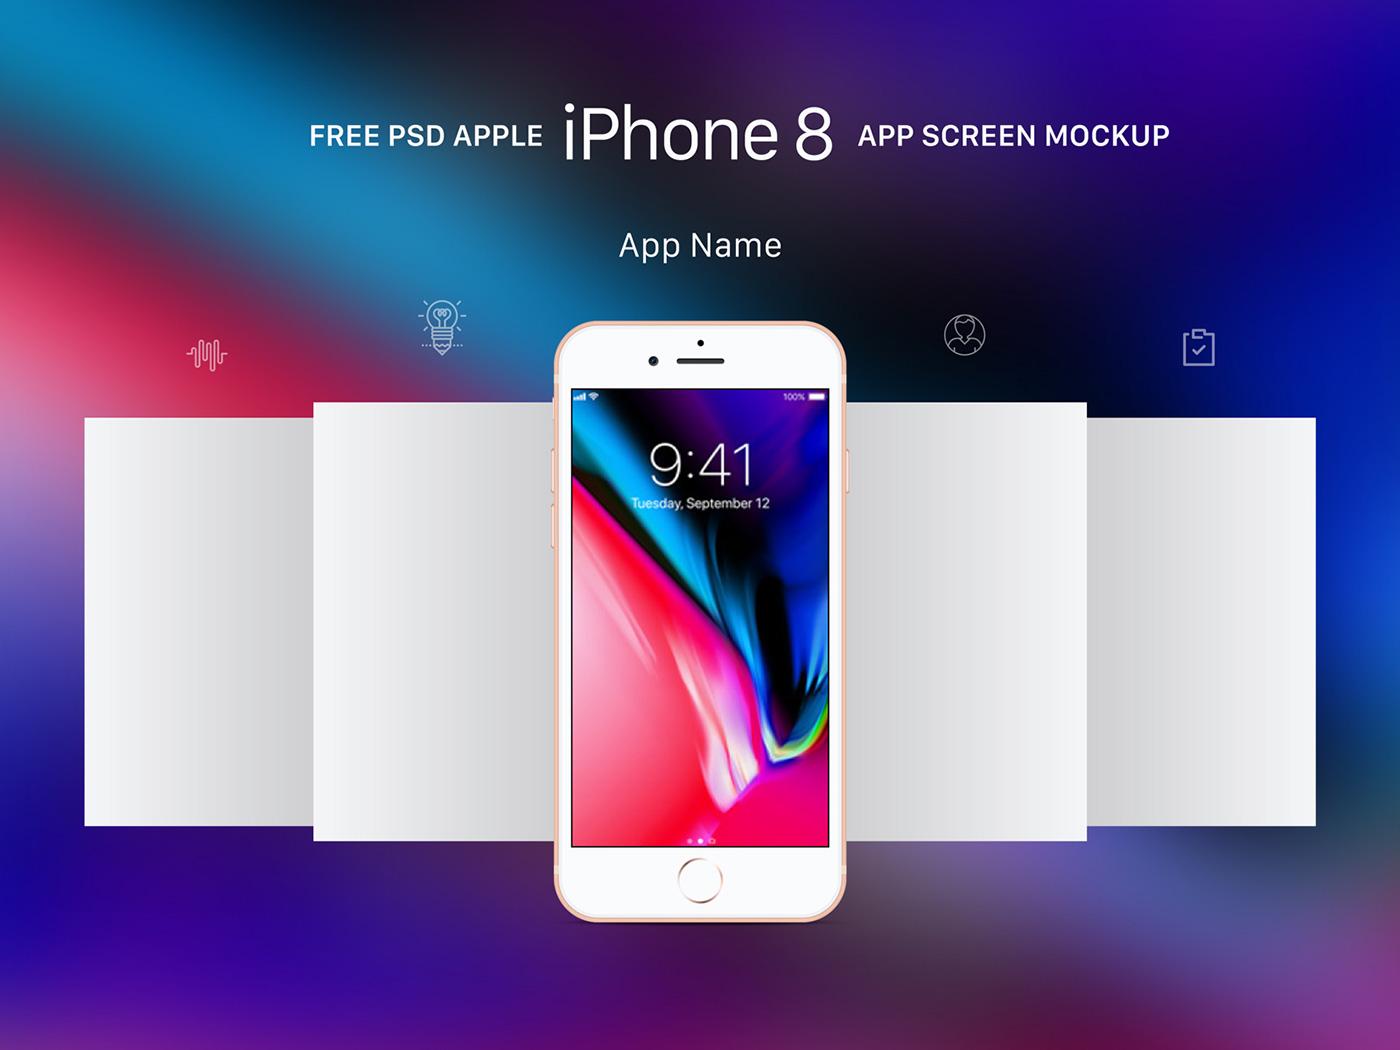 Free Apple iPhone 8 App Screen Mockup PSD on Behance